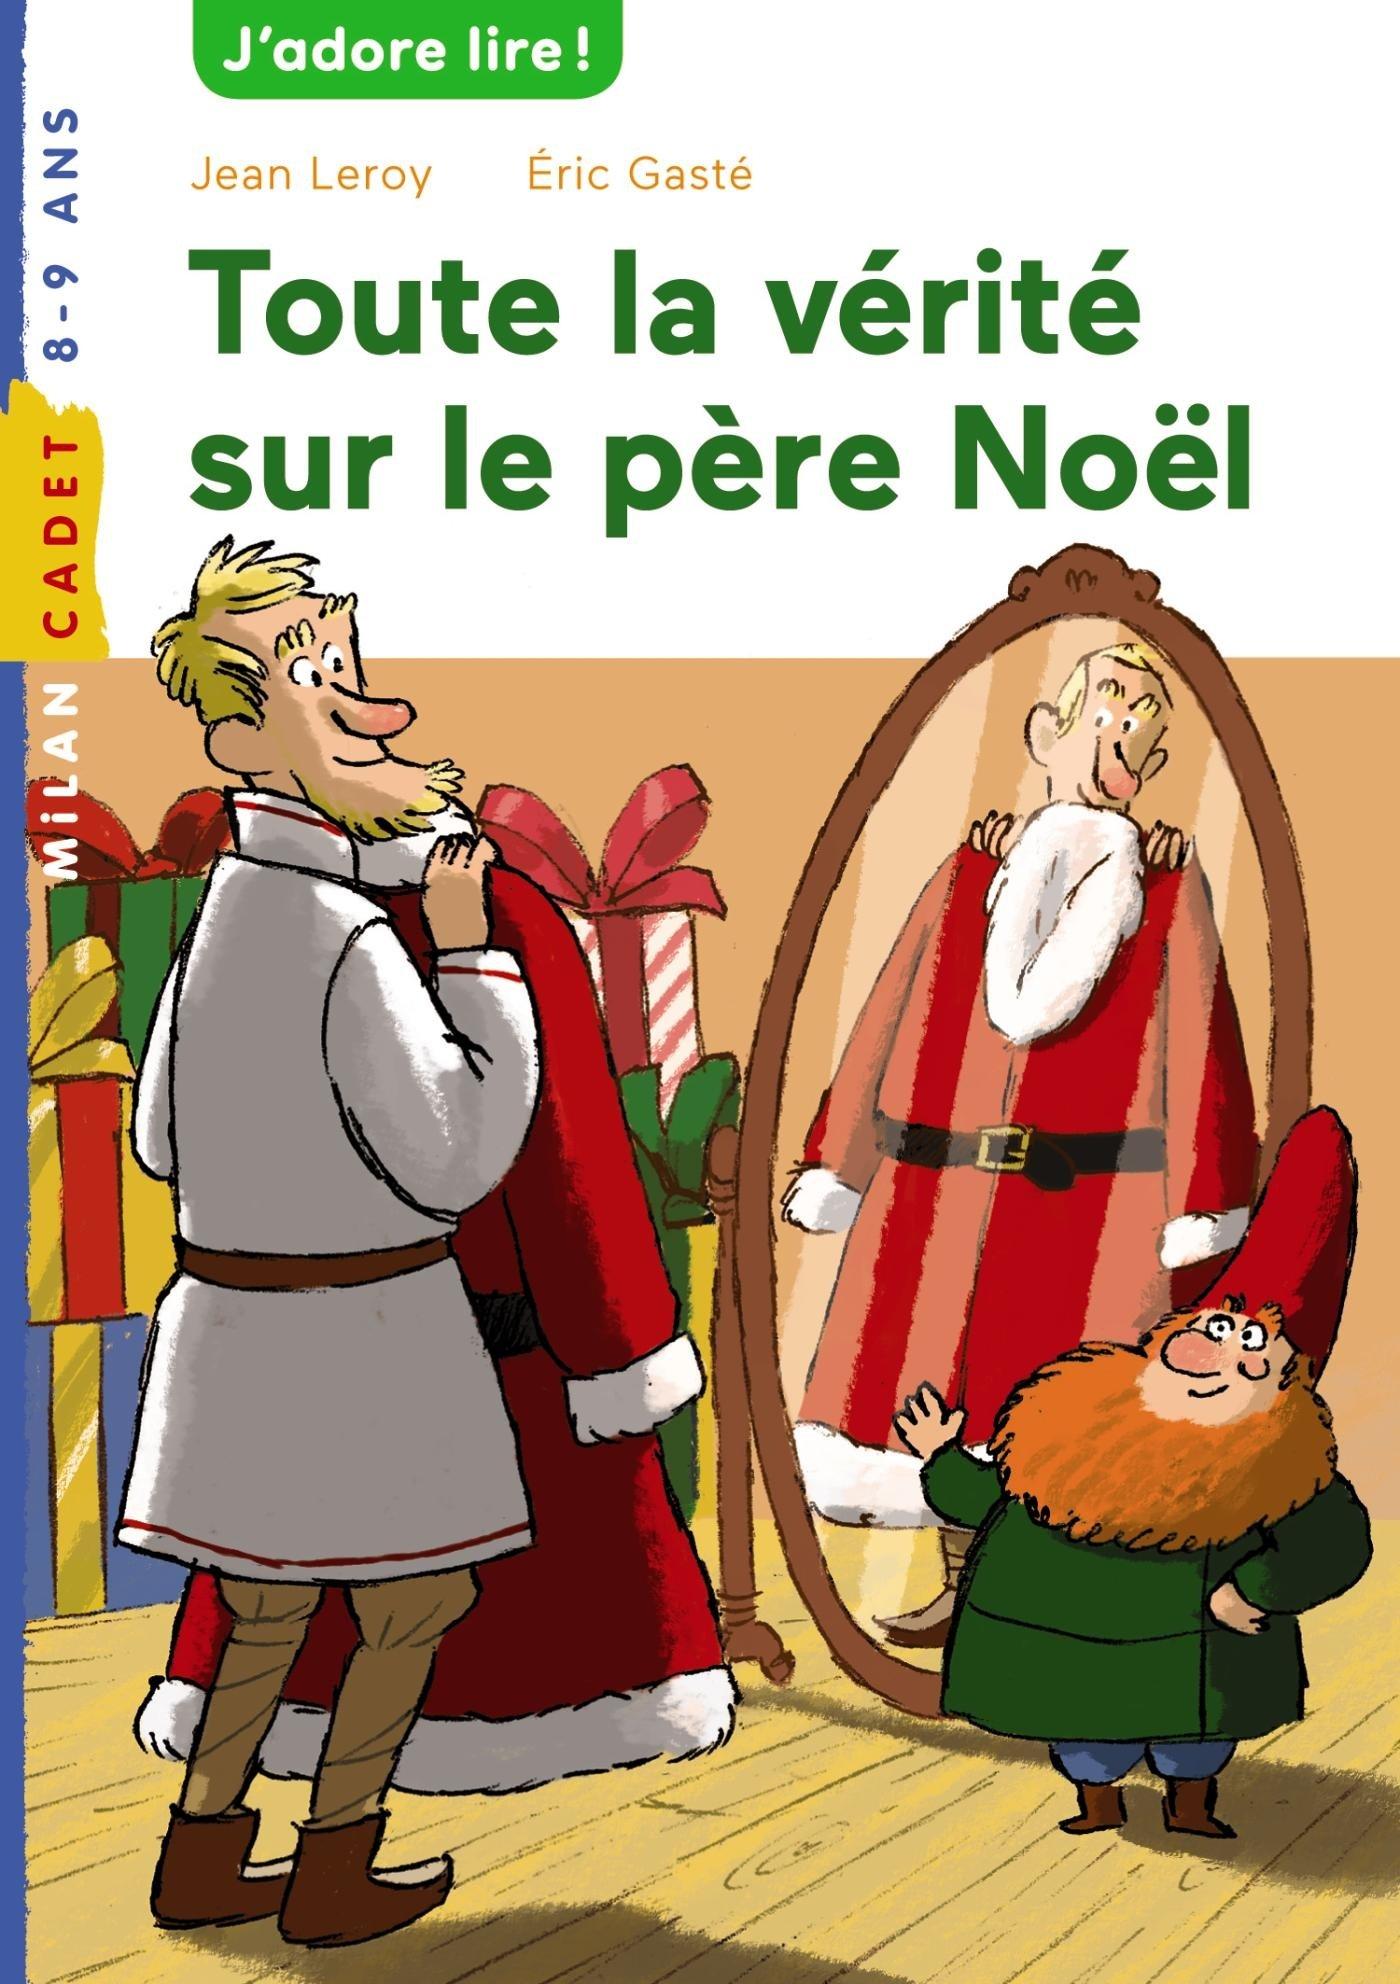 Nouveau Image De Pere Noel Rigolote